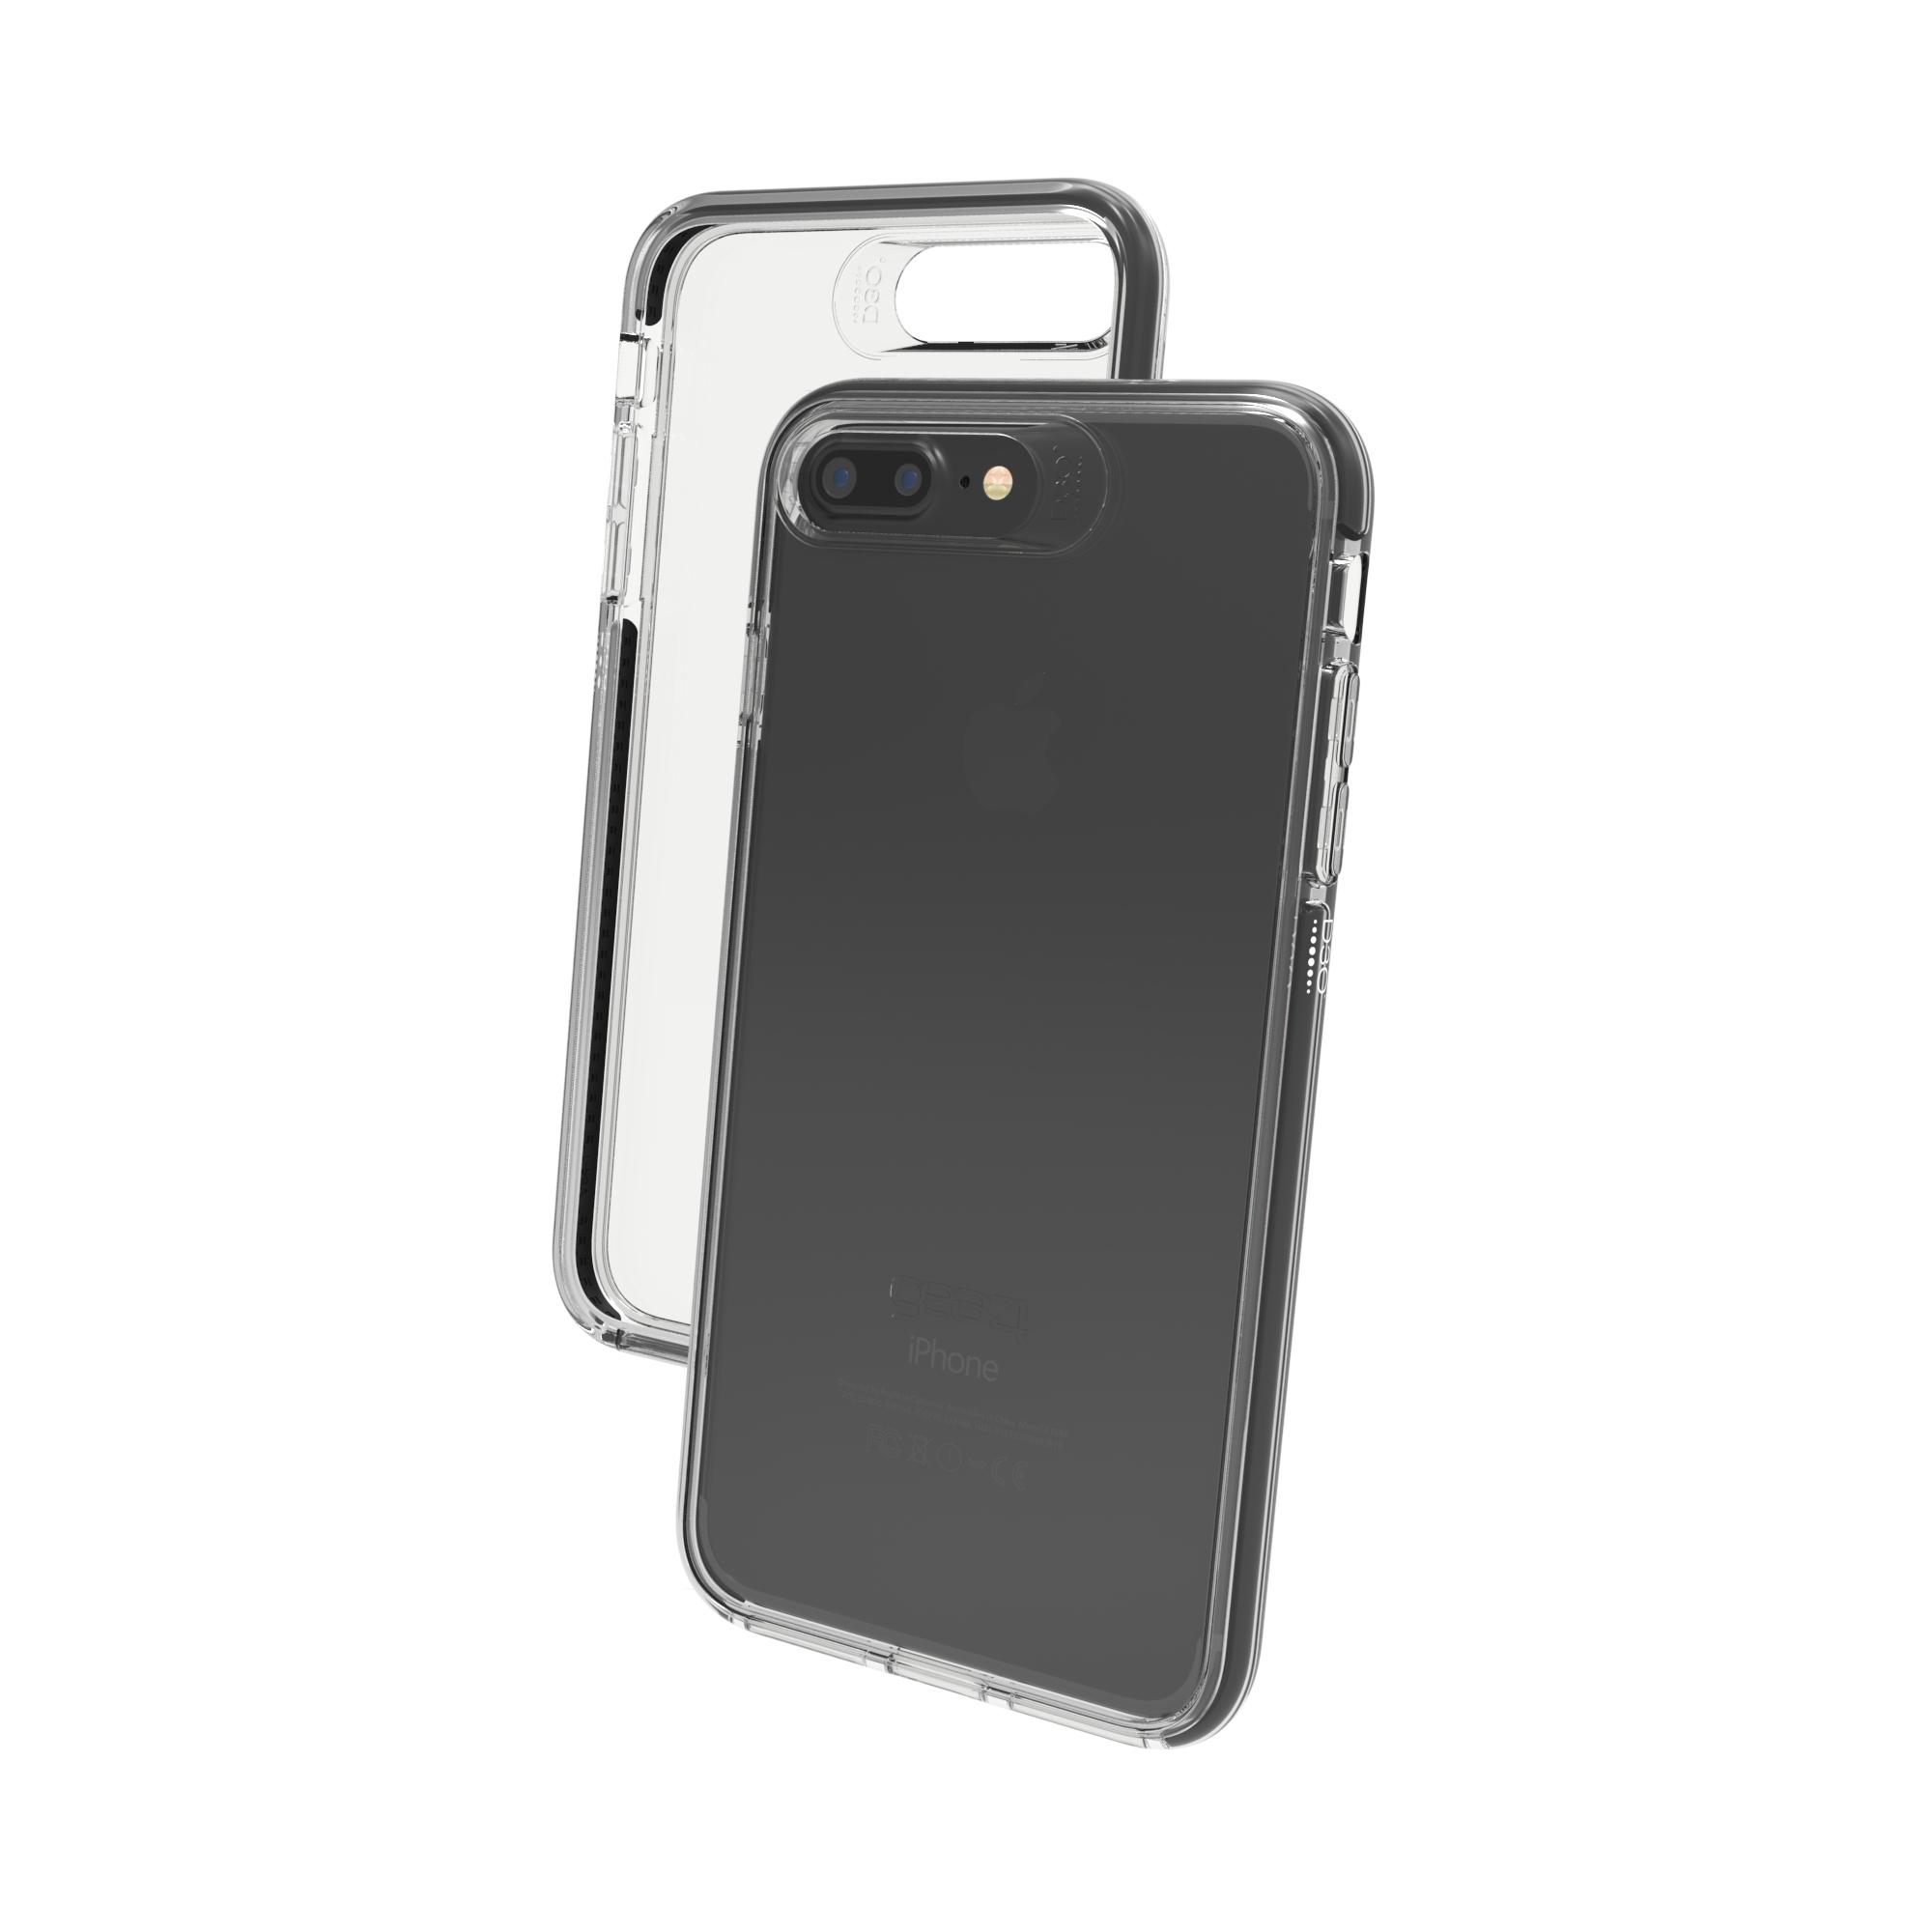 "GEAR4 Piccadilly funda para teléfono móvil 14 cm (5.5"") Negro, Transparente"